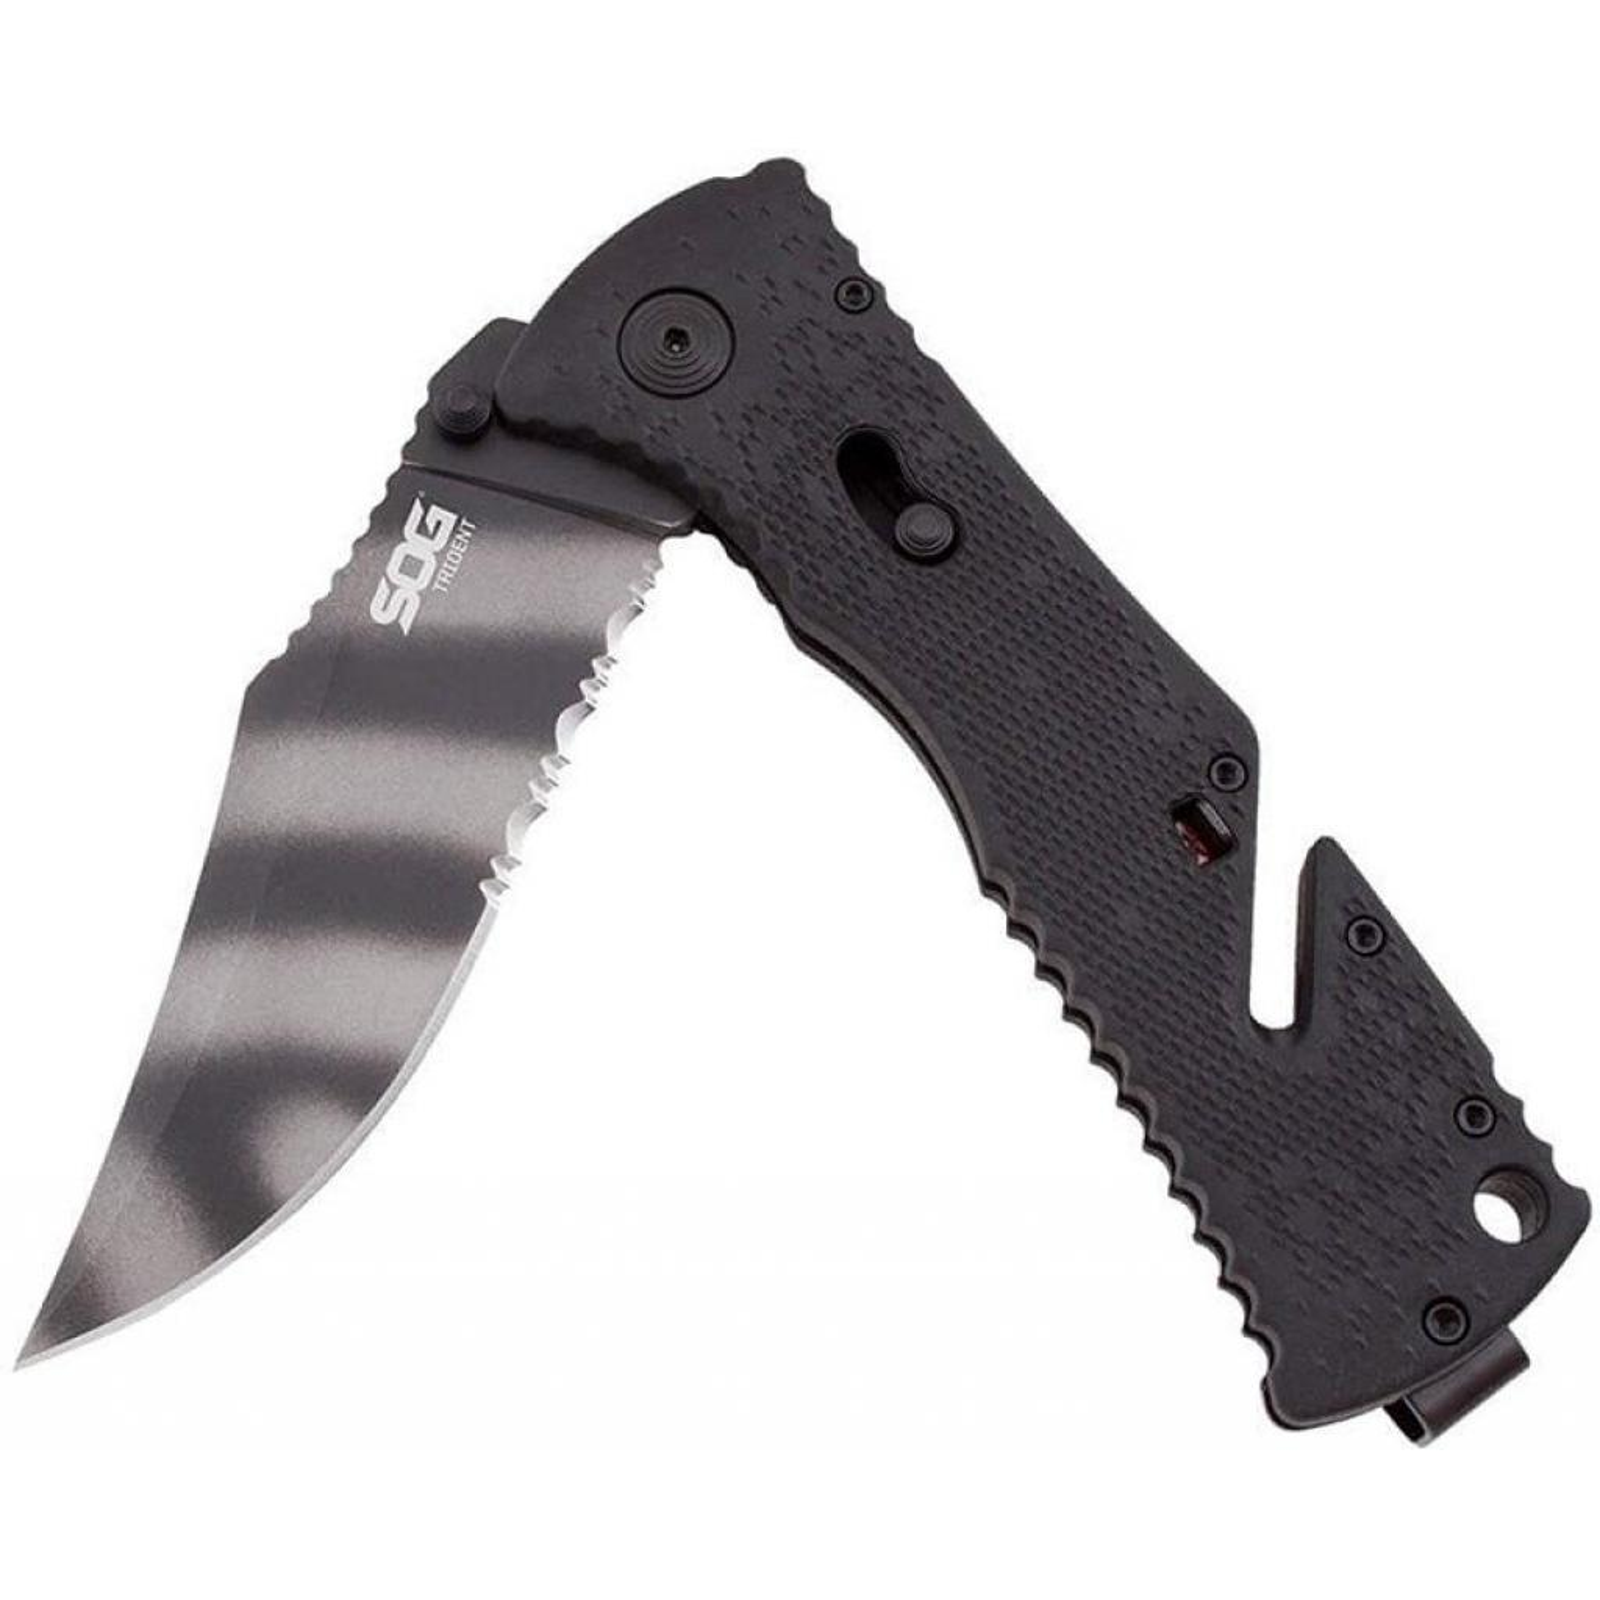 Нож SOG Trident Black Blade Serrated (TF3-BX) изображение 4